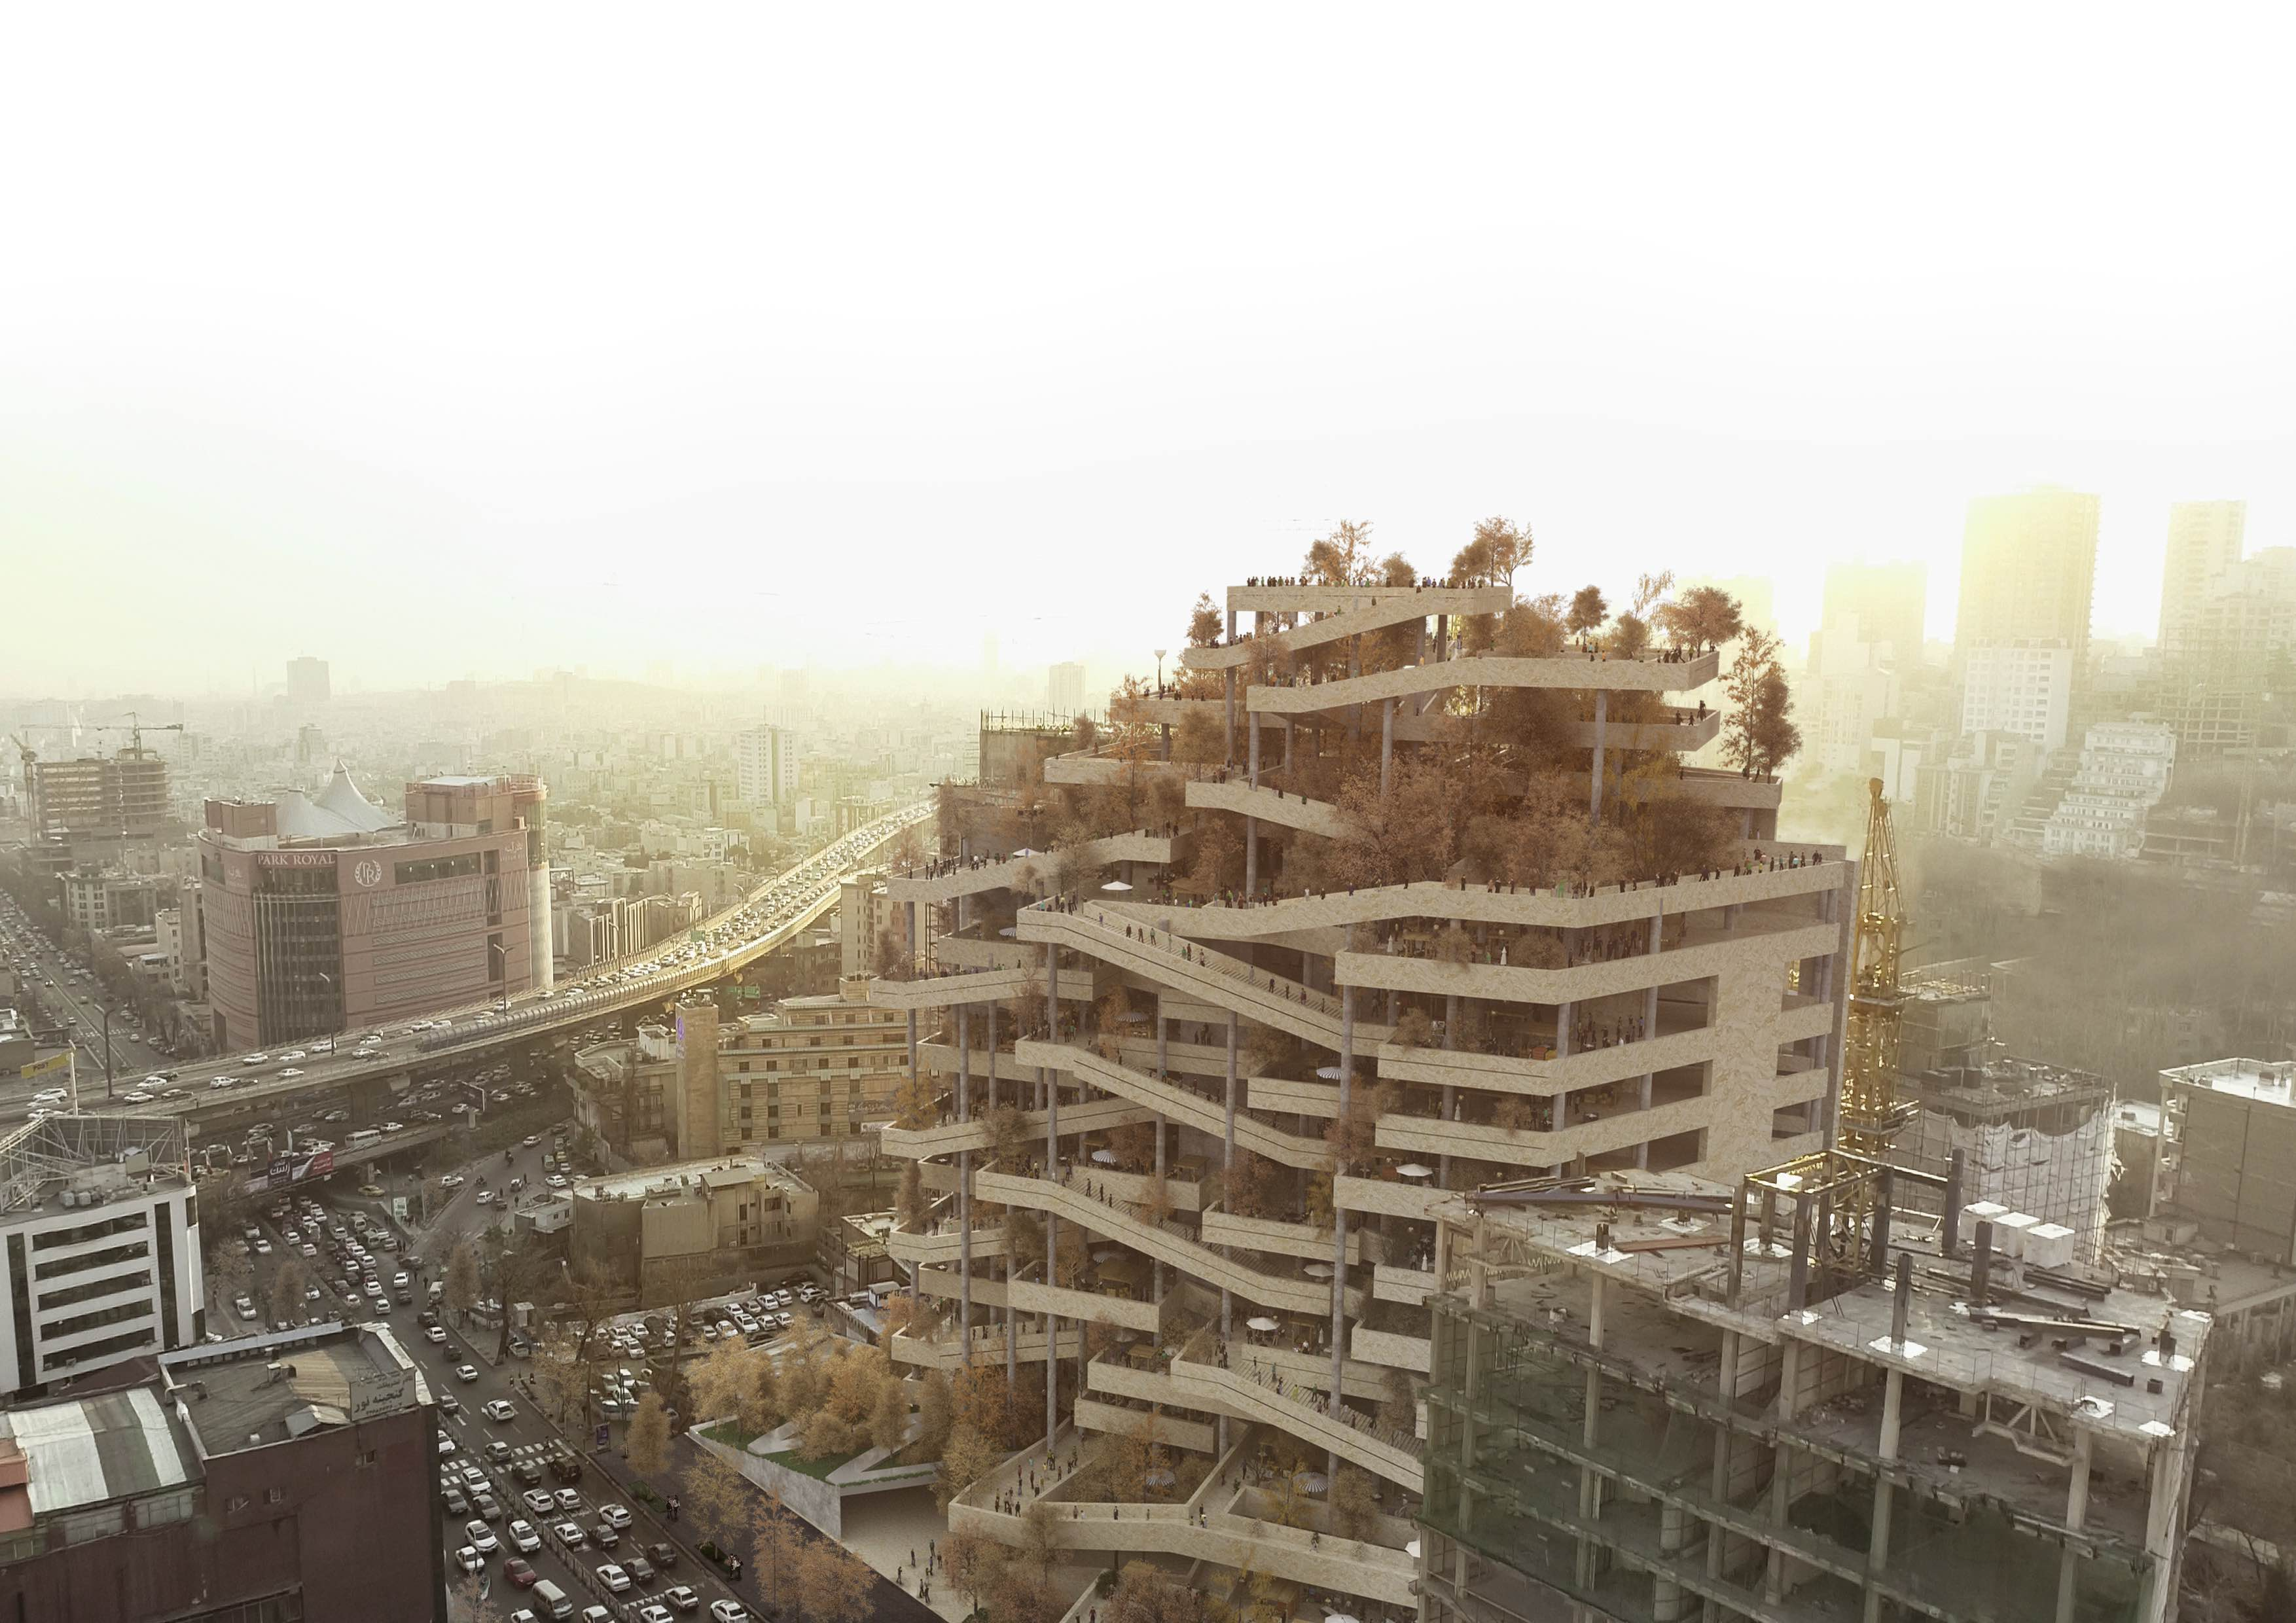 Tehran_Eye_Vertical_Street_Farshad_Mehdizadeh%20_AmazingArchitecture_001.jpg